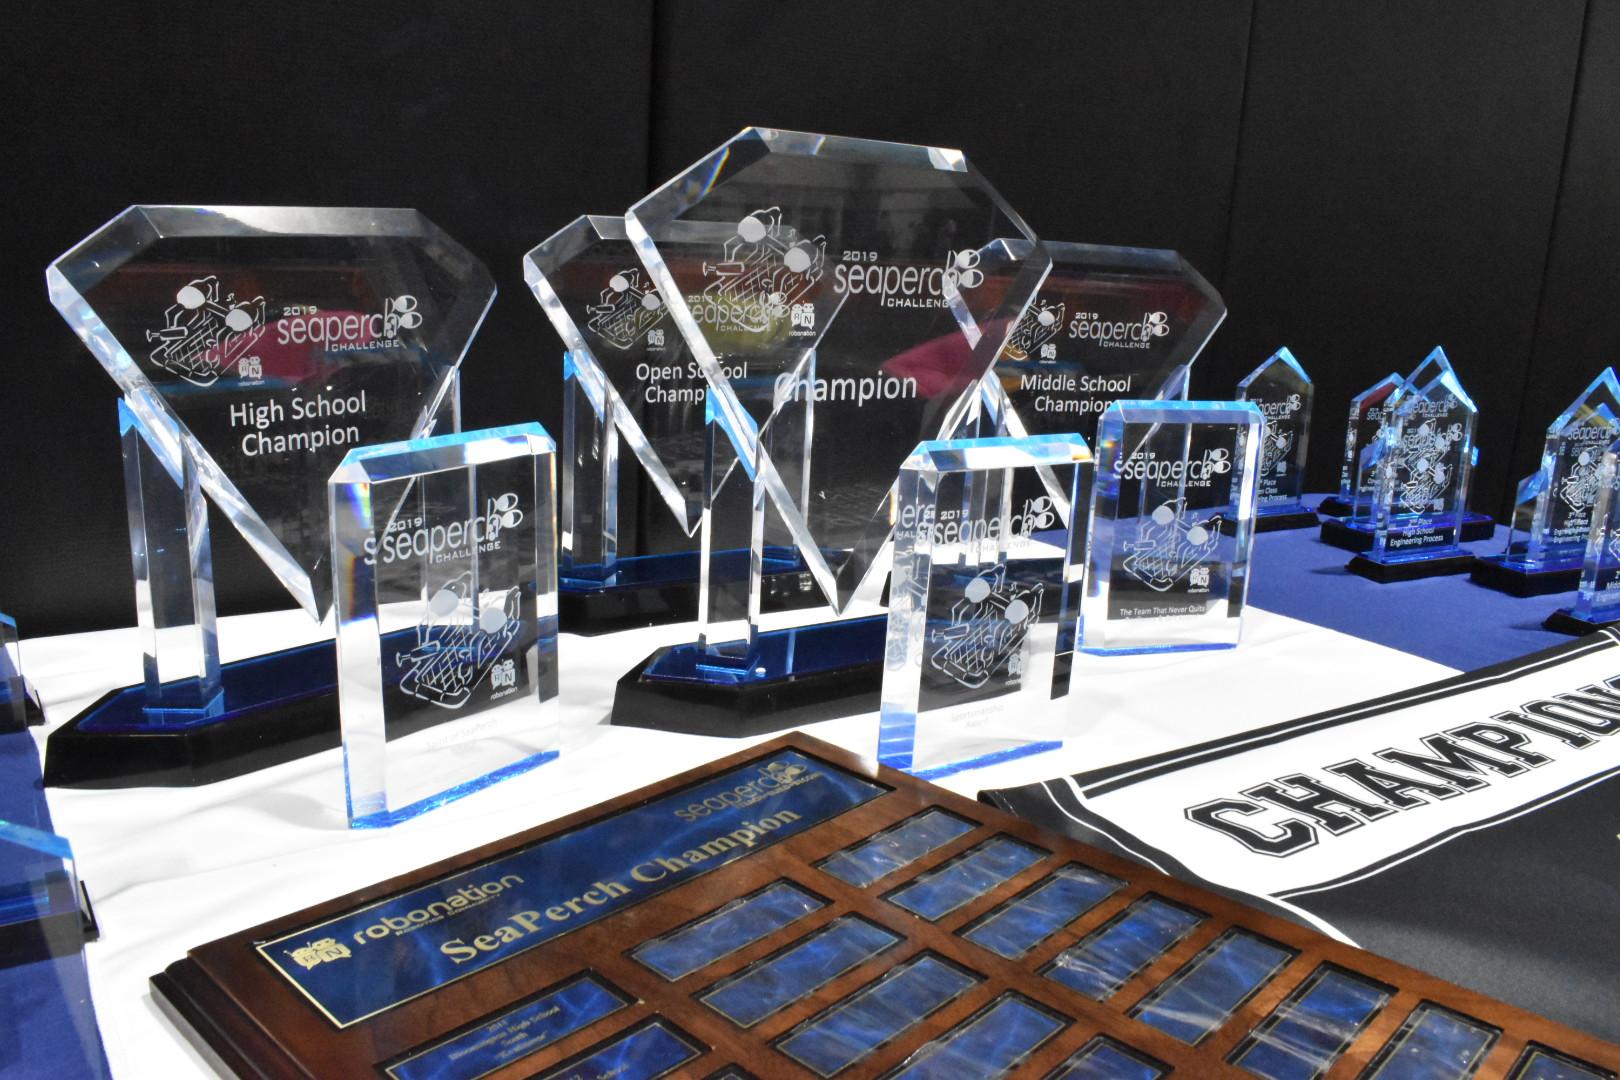 2019 International SeaPerch Challenge Awards